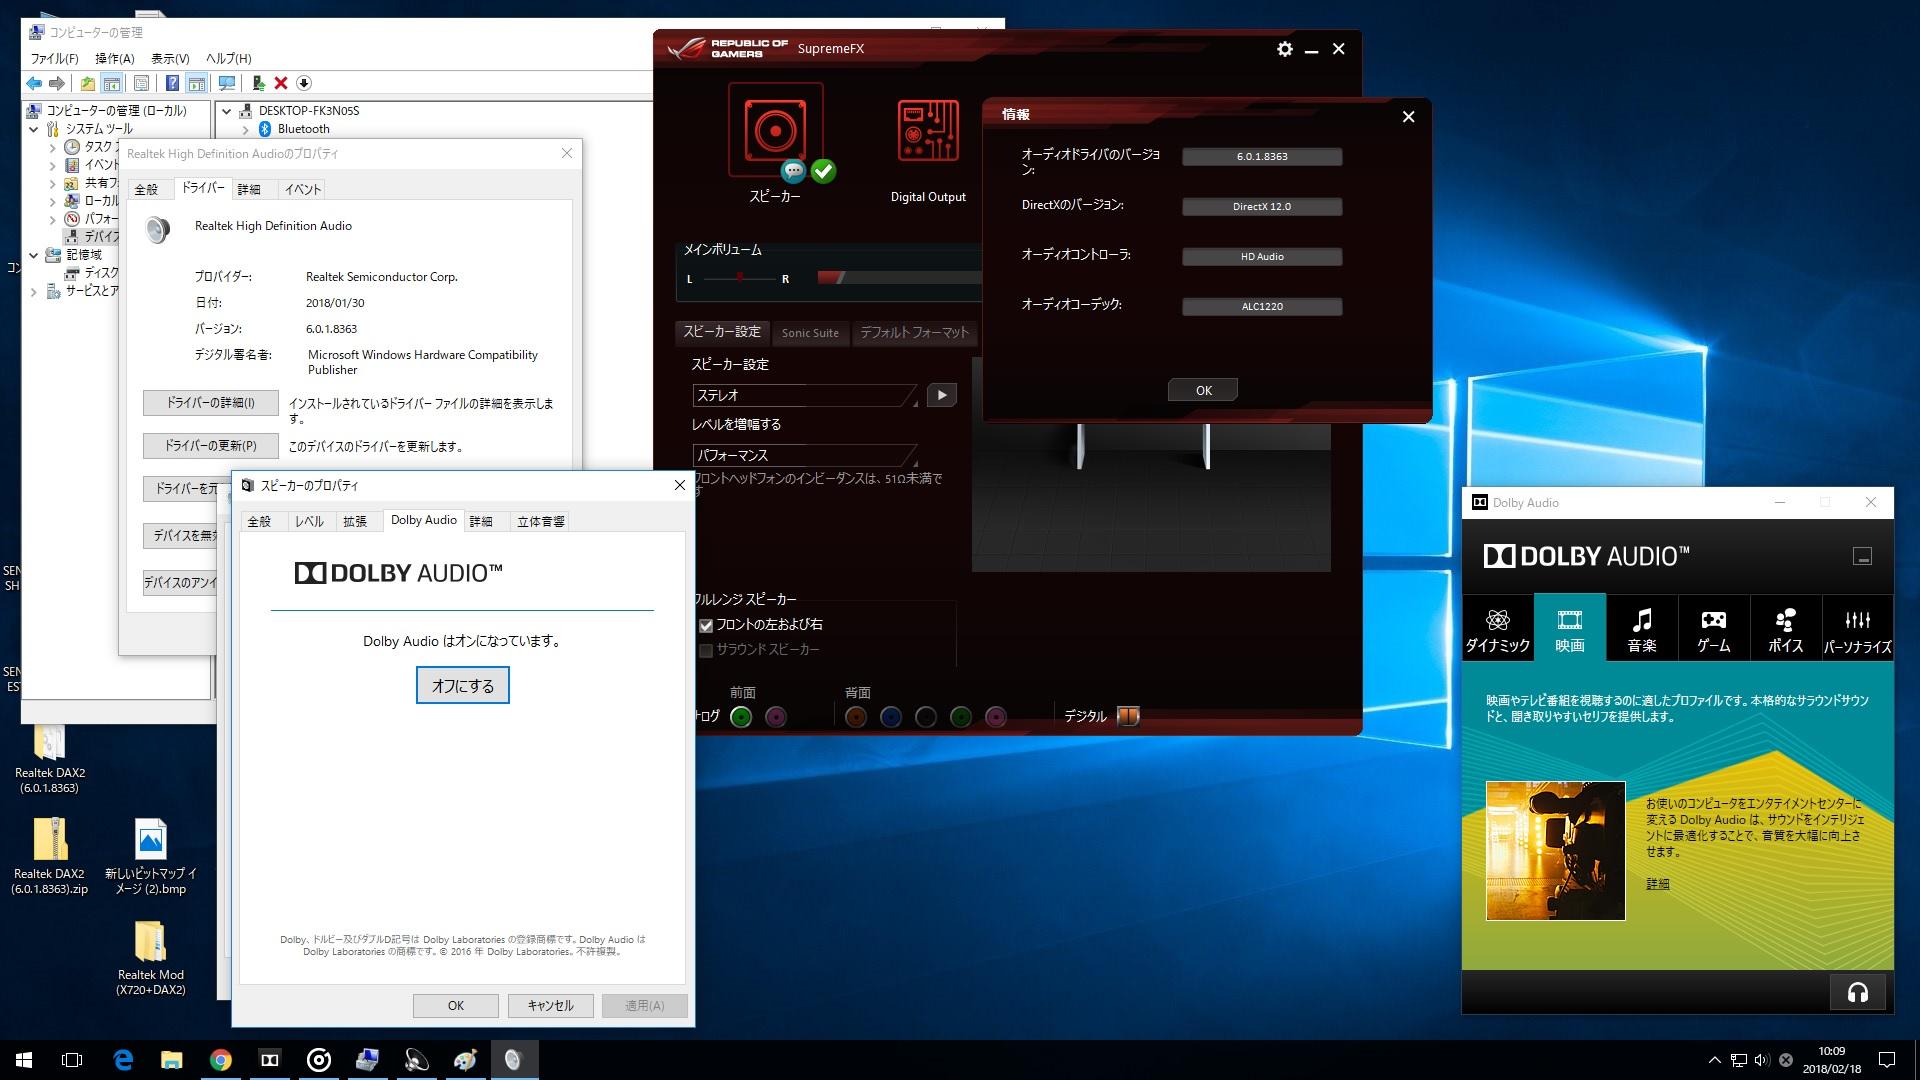 realtek high definition audio codec driver 2.65 32 bit